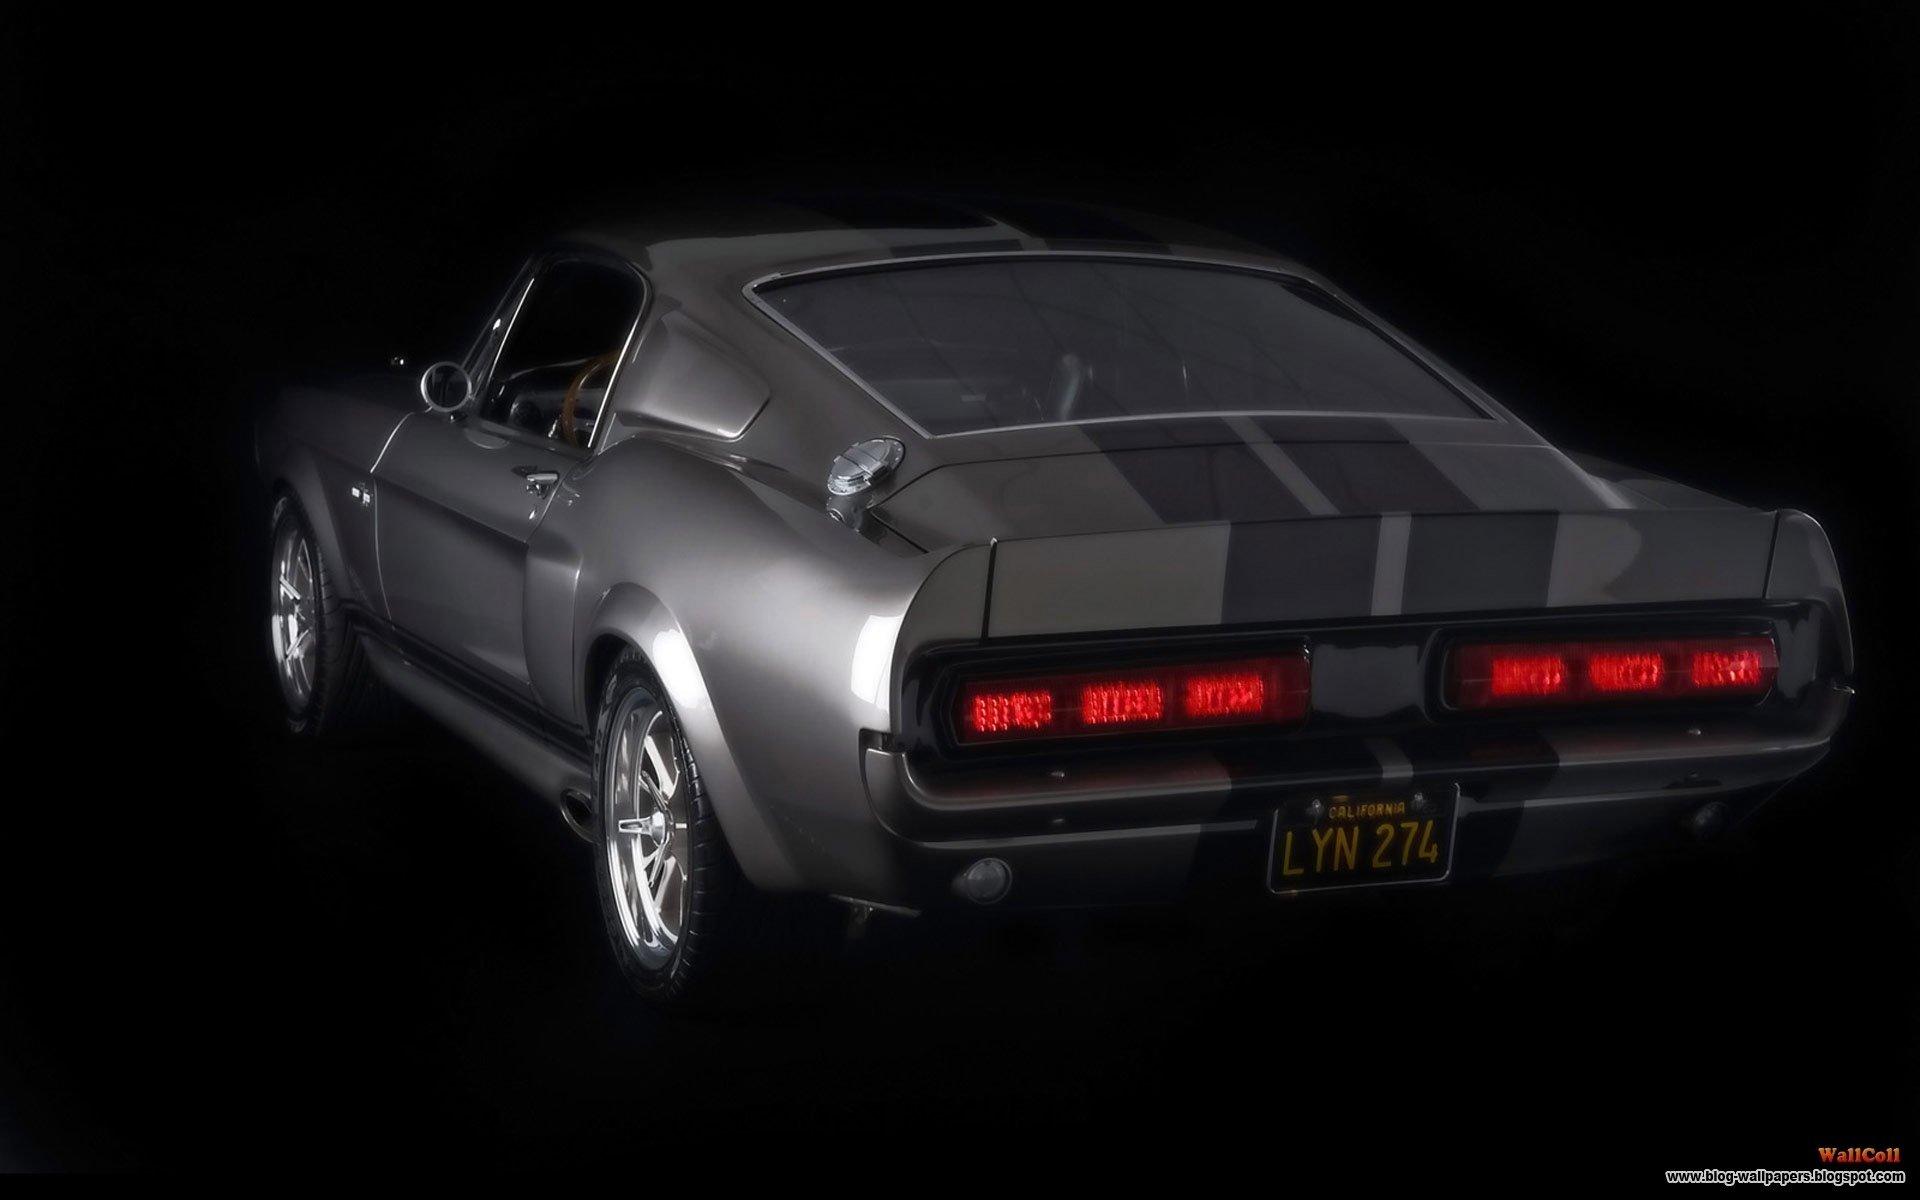 Shelby Mustang Gt500 Eleanor Gone In 60 Seconds Hd Wallpaper